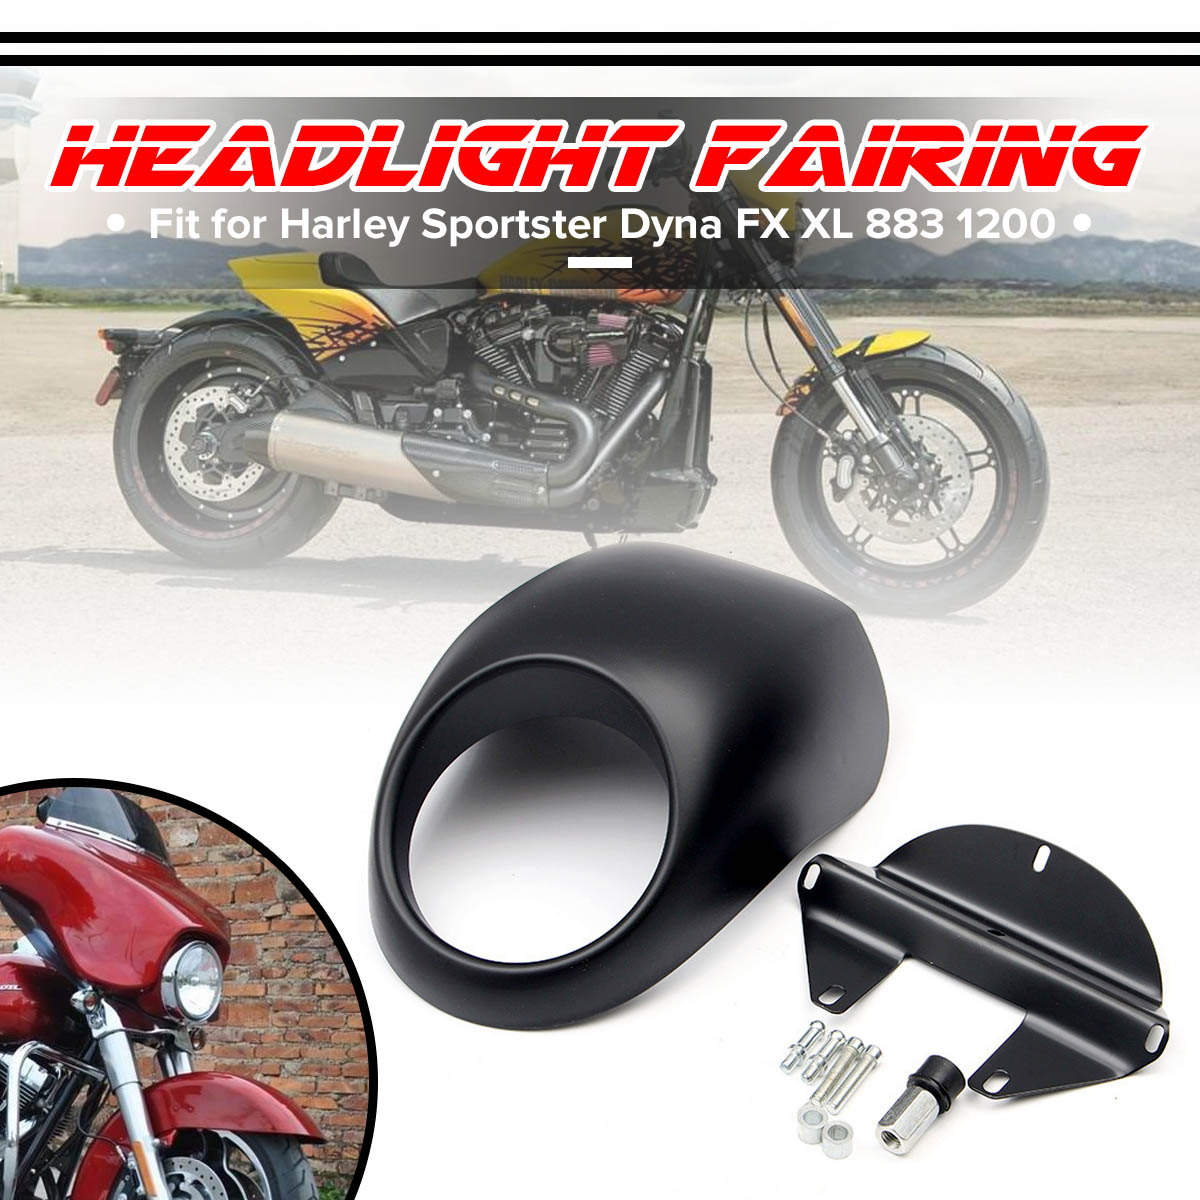 Moto Head light Masque Phare Carénage Avant Cowl Fork Montage Pour Harley Sportster Dyna FX XL 883 1200 Moteur Accessoires